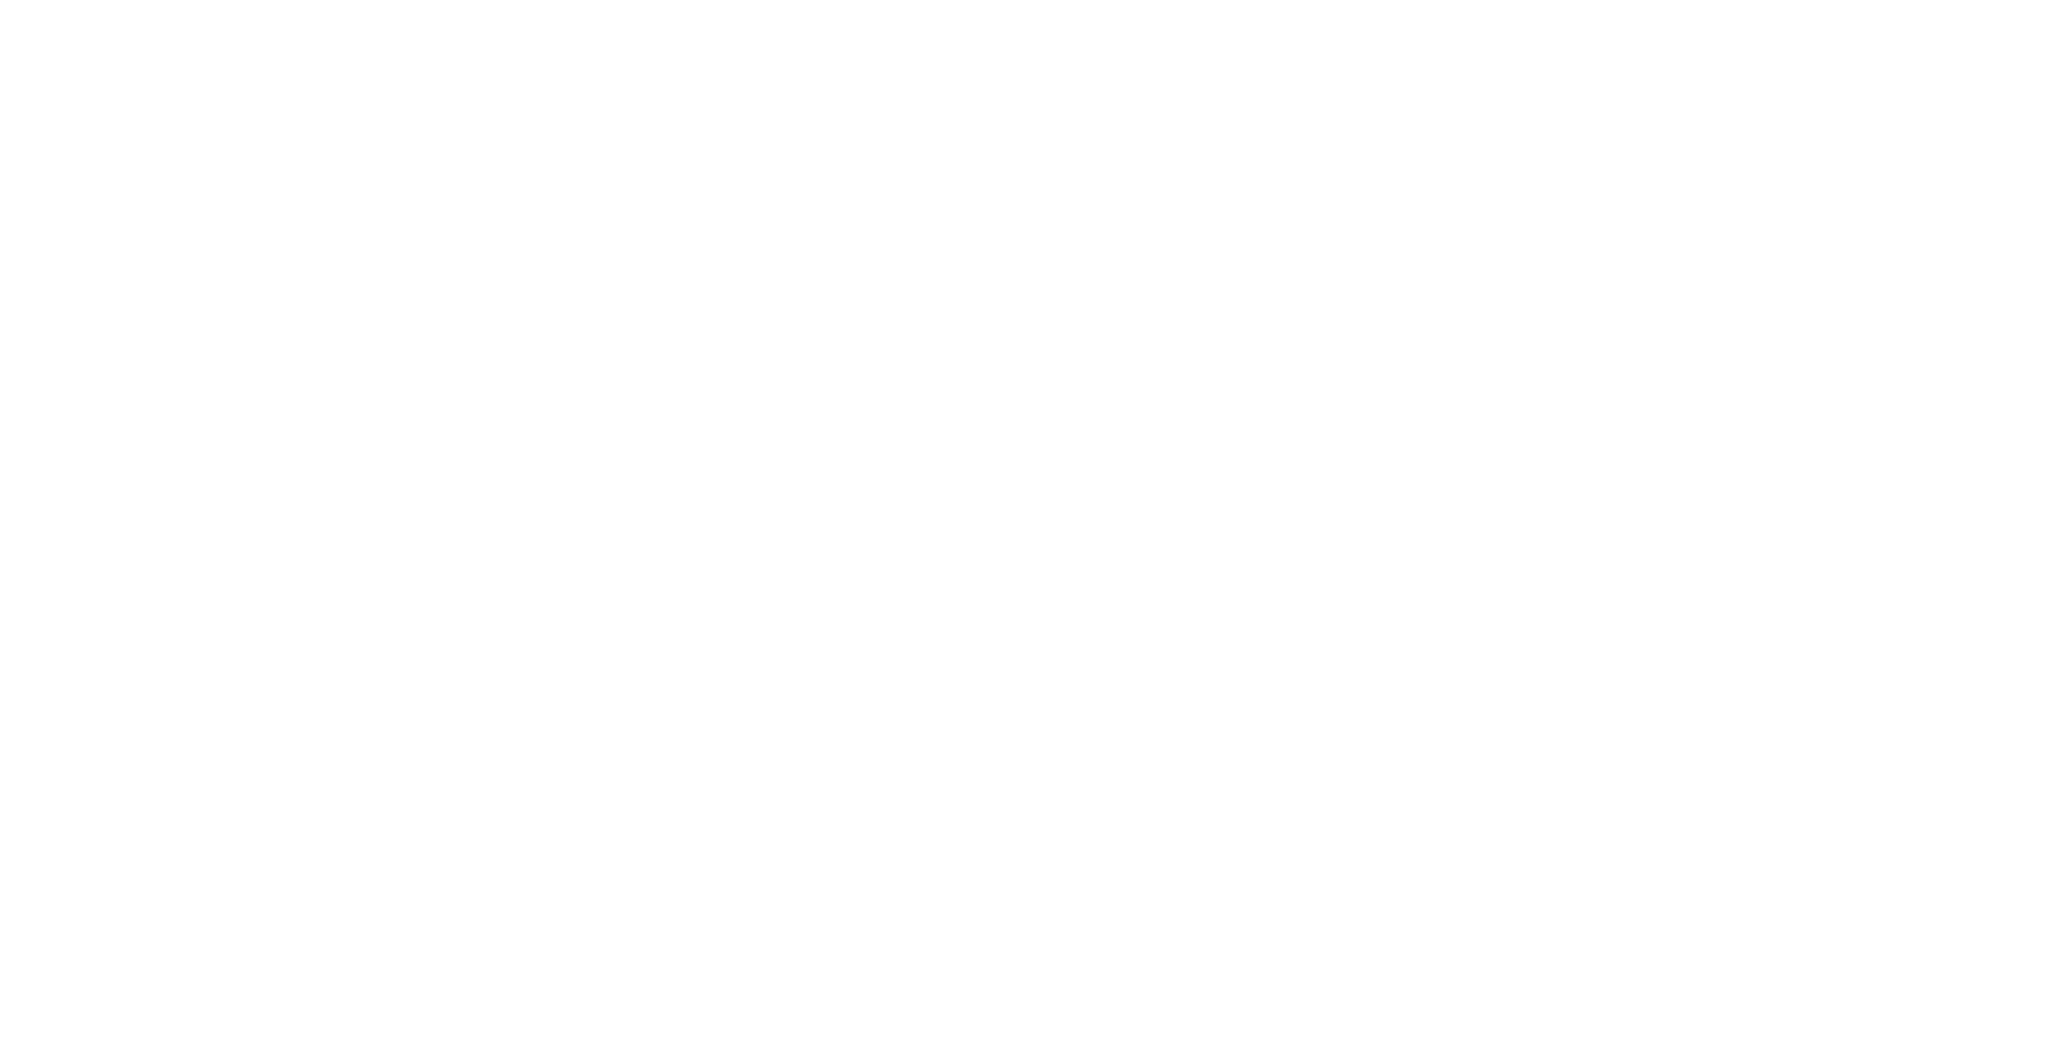 imb web 1920 becas talento imb logo